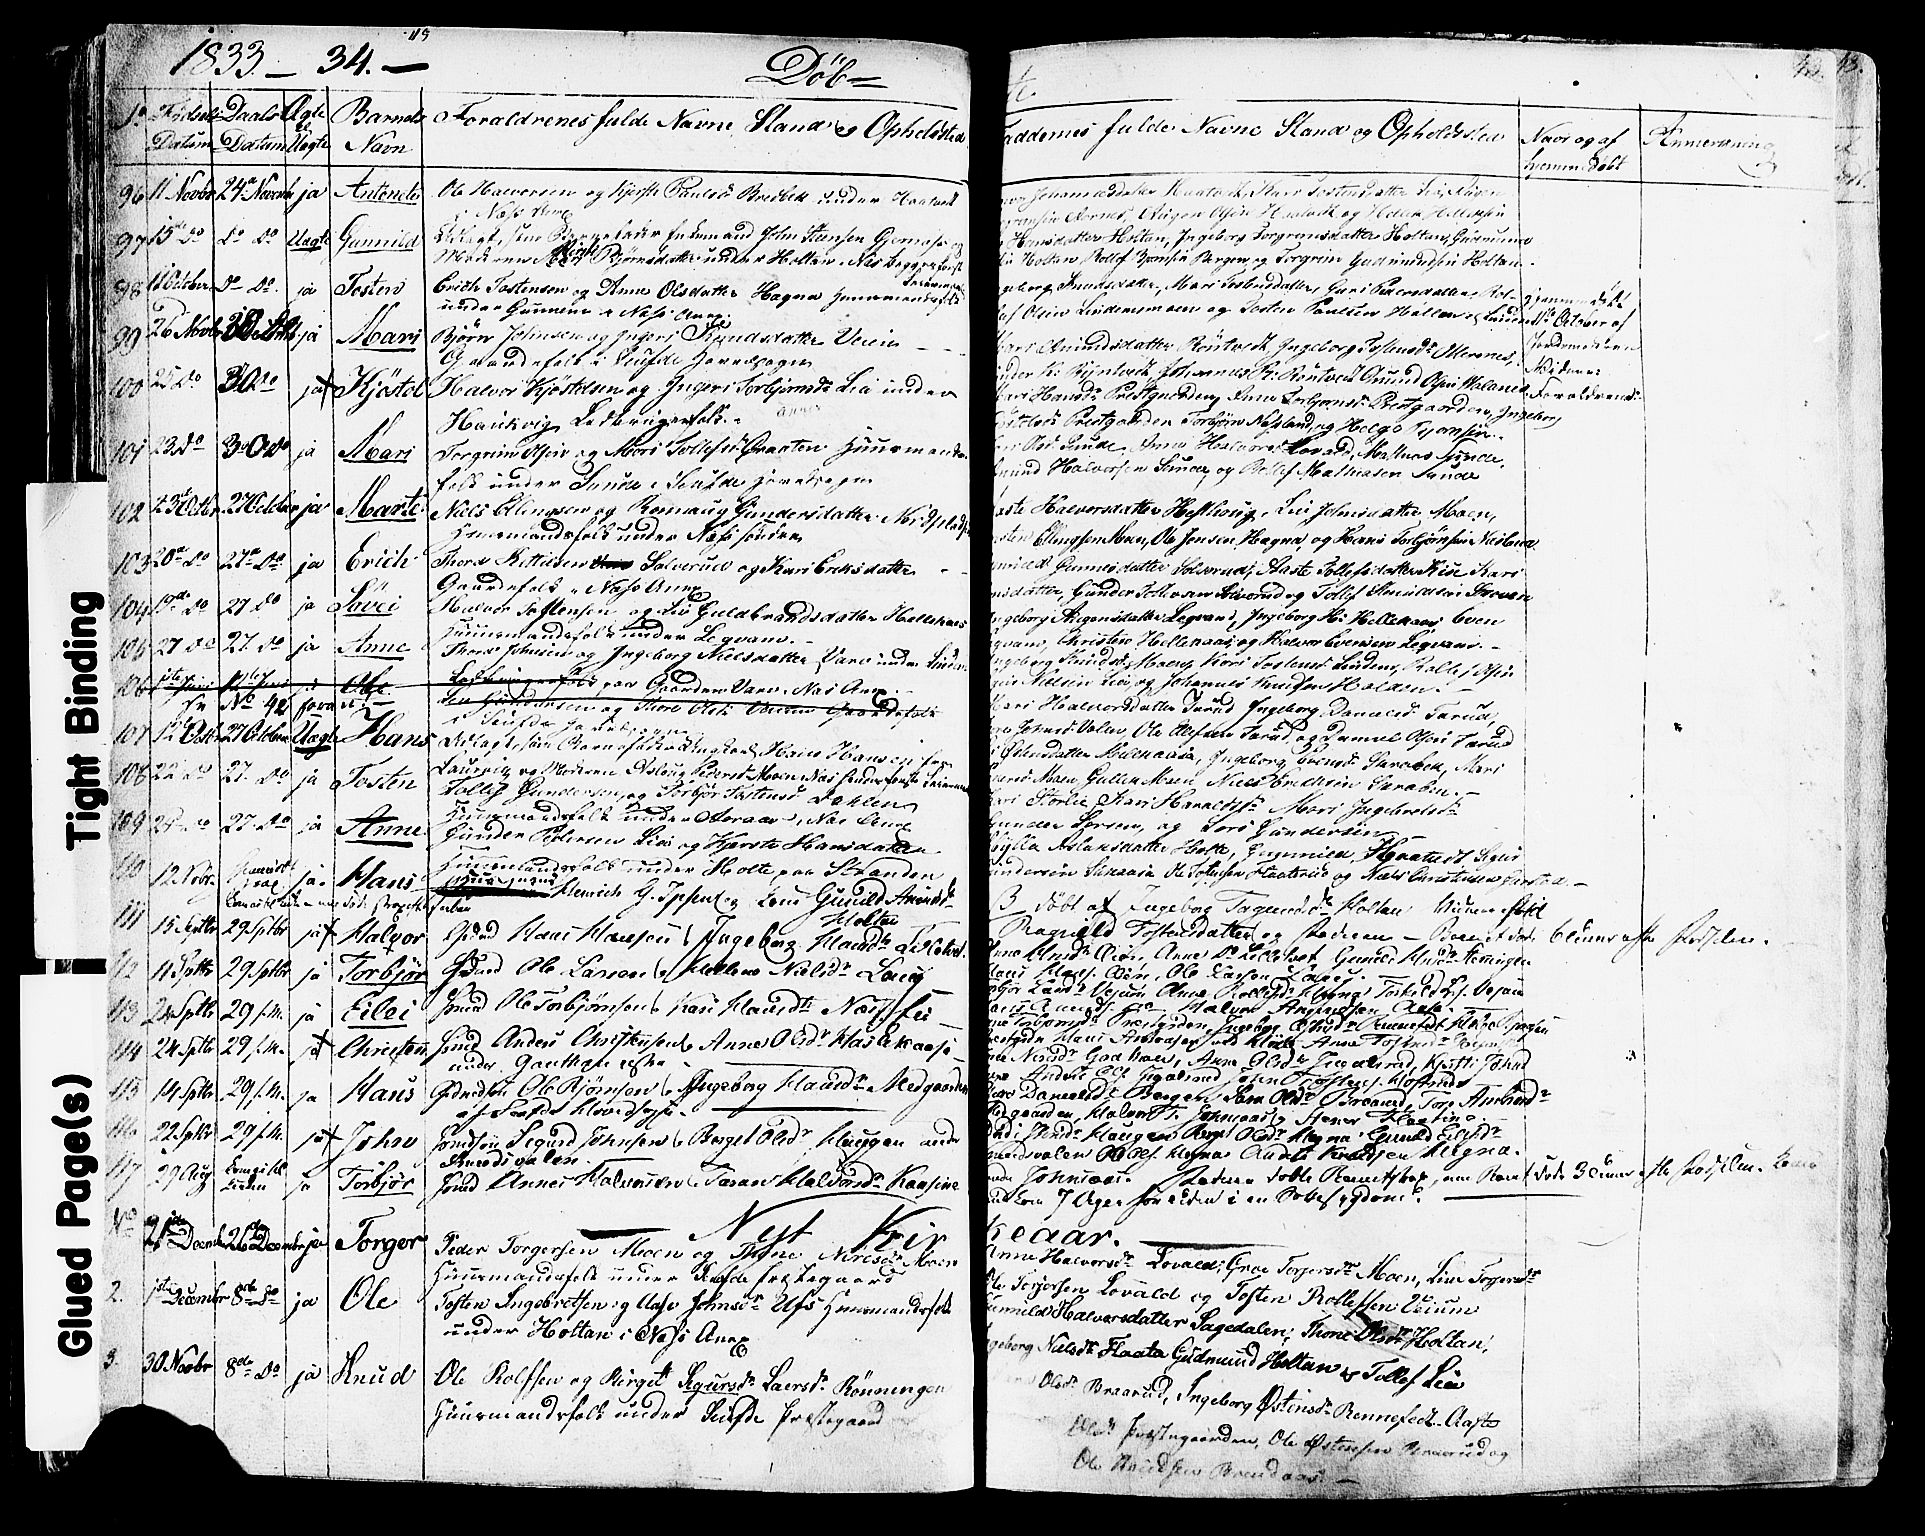 SAKO, Sauherad kirkebøker, F/Fa/L0006: Ministerialbok nr. I 6, 1827-1850, s. 43